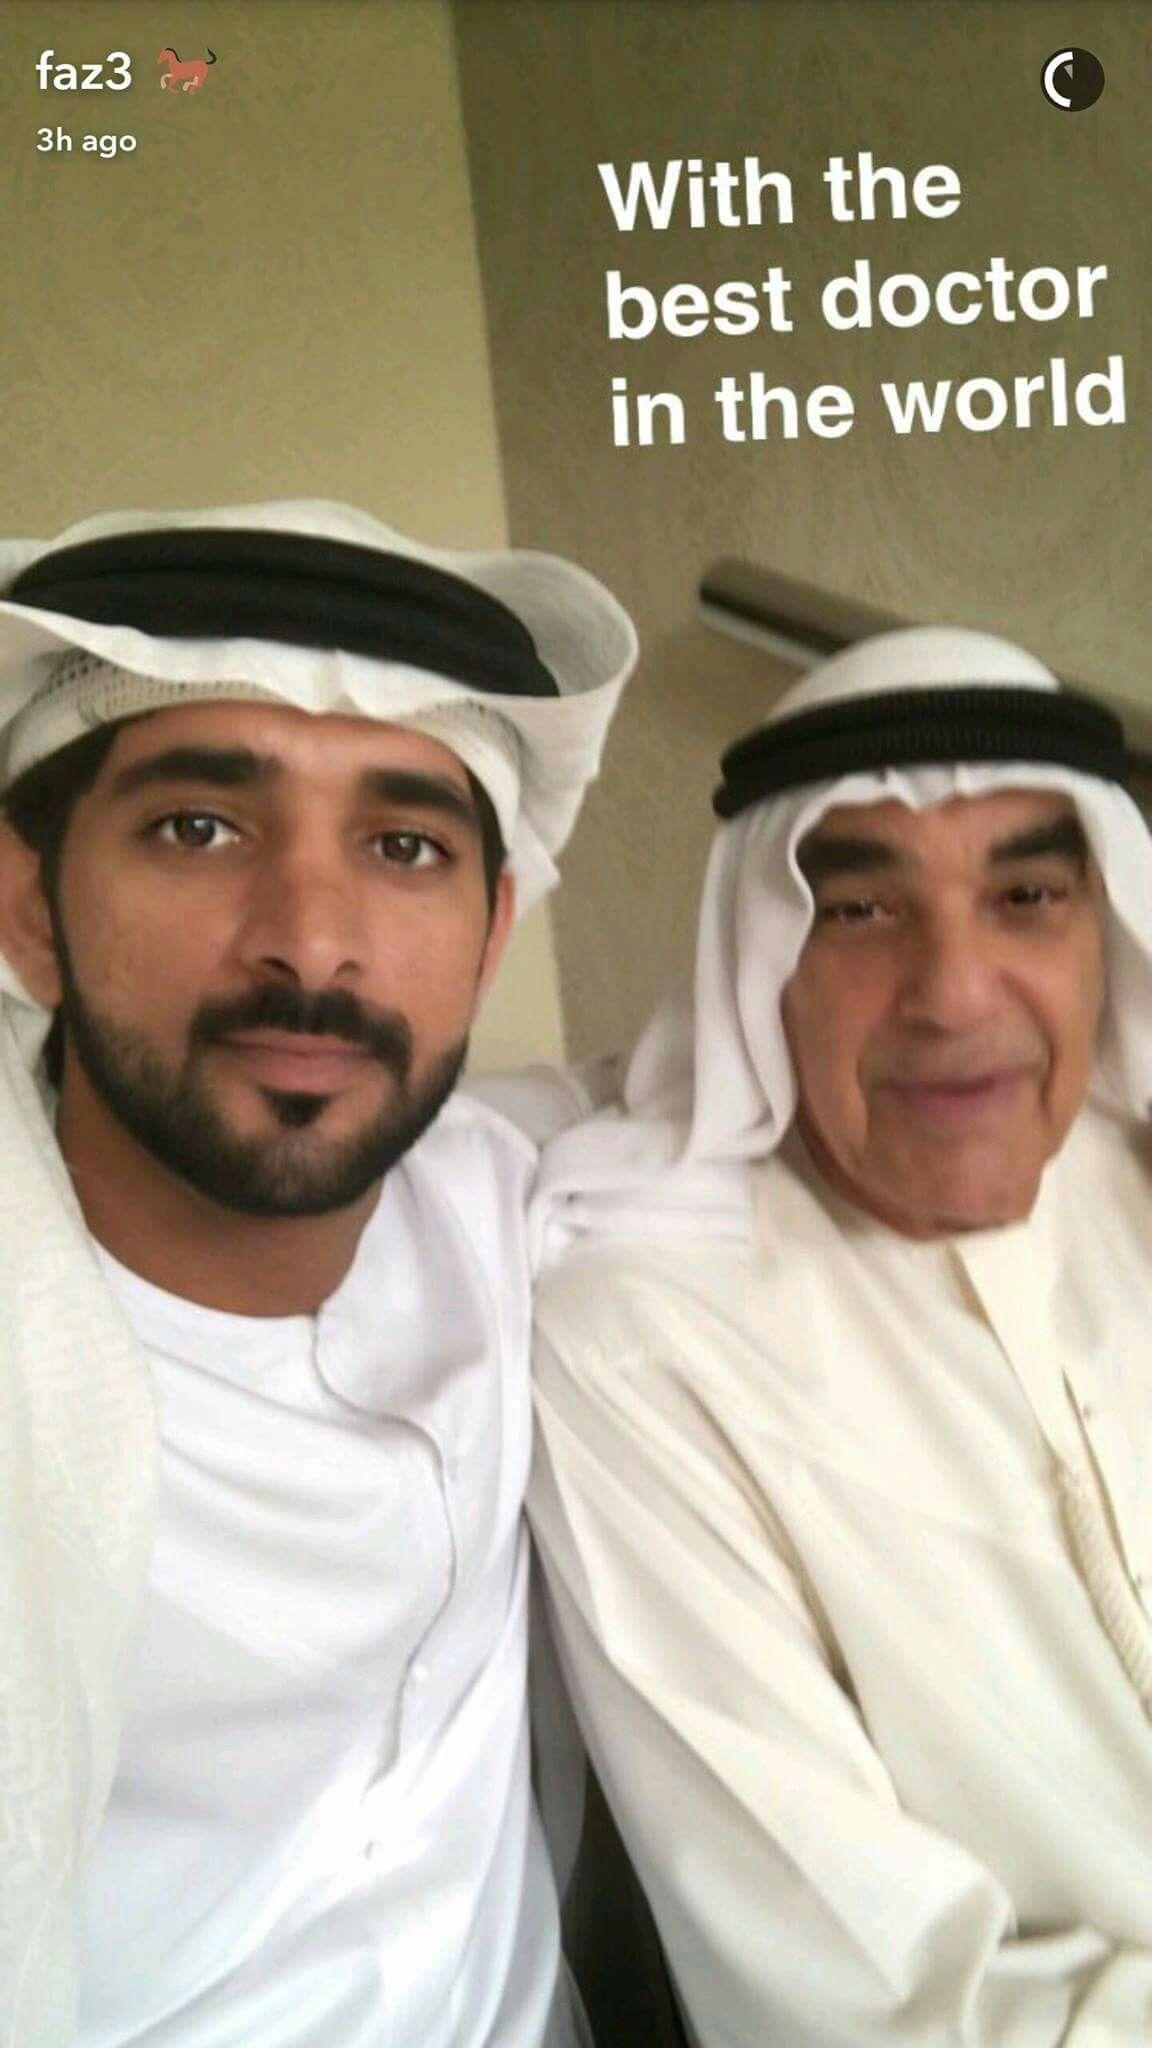 Prince Hamdan Snapchat : faz3 7/11/2016